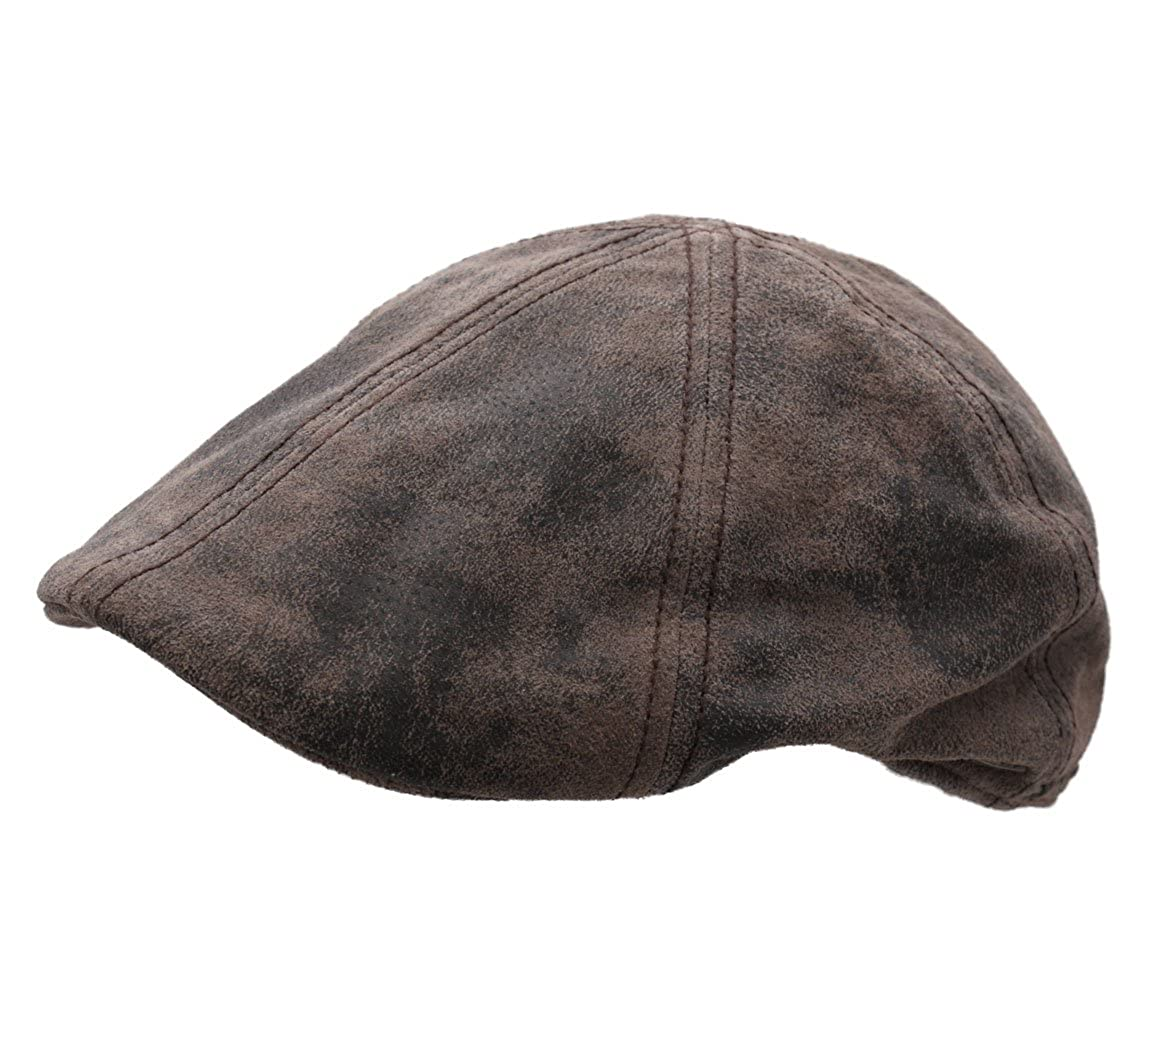 Stetson Mens Texas Pigskin Leather Flat Cap